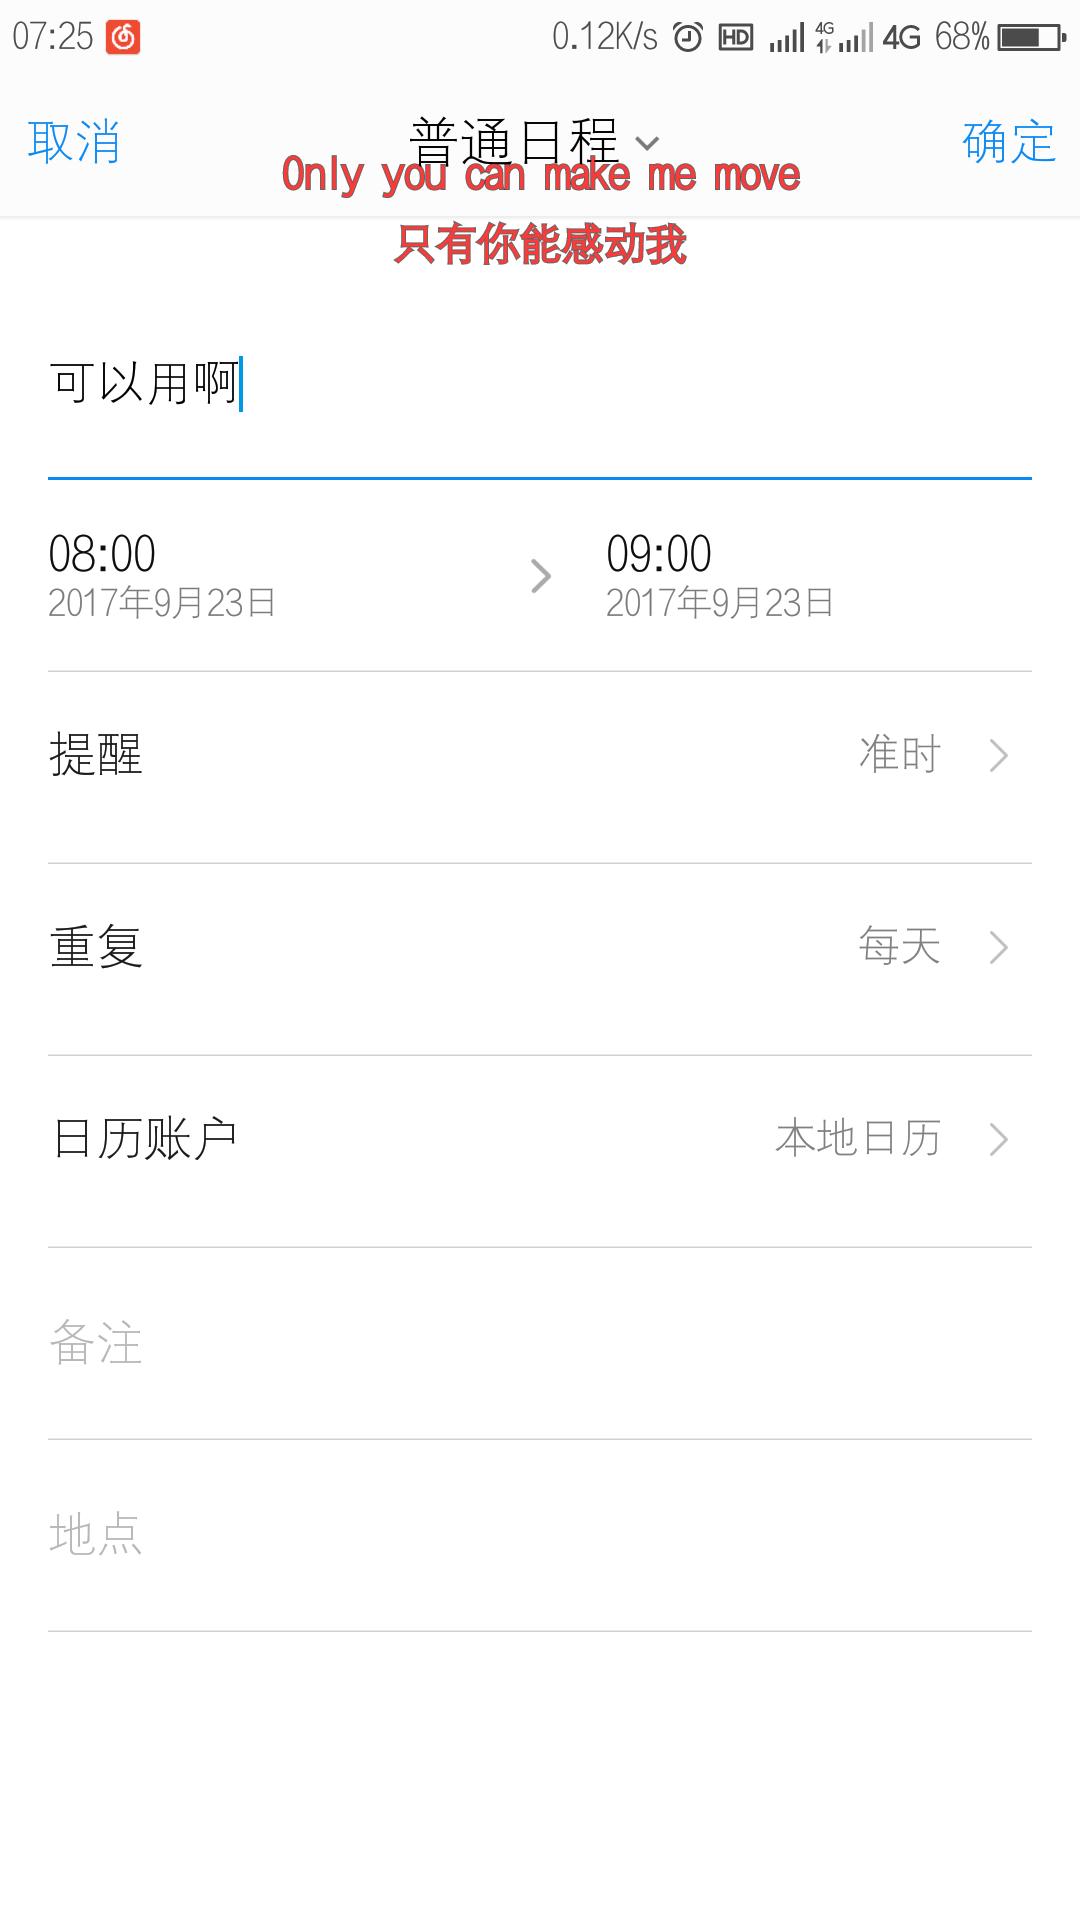 Screenshot_2017-09-23-07-25-41.png